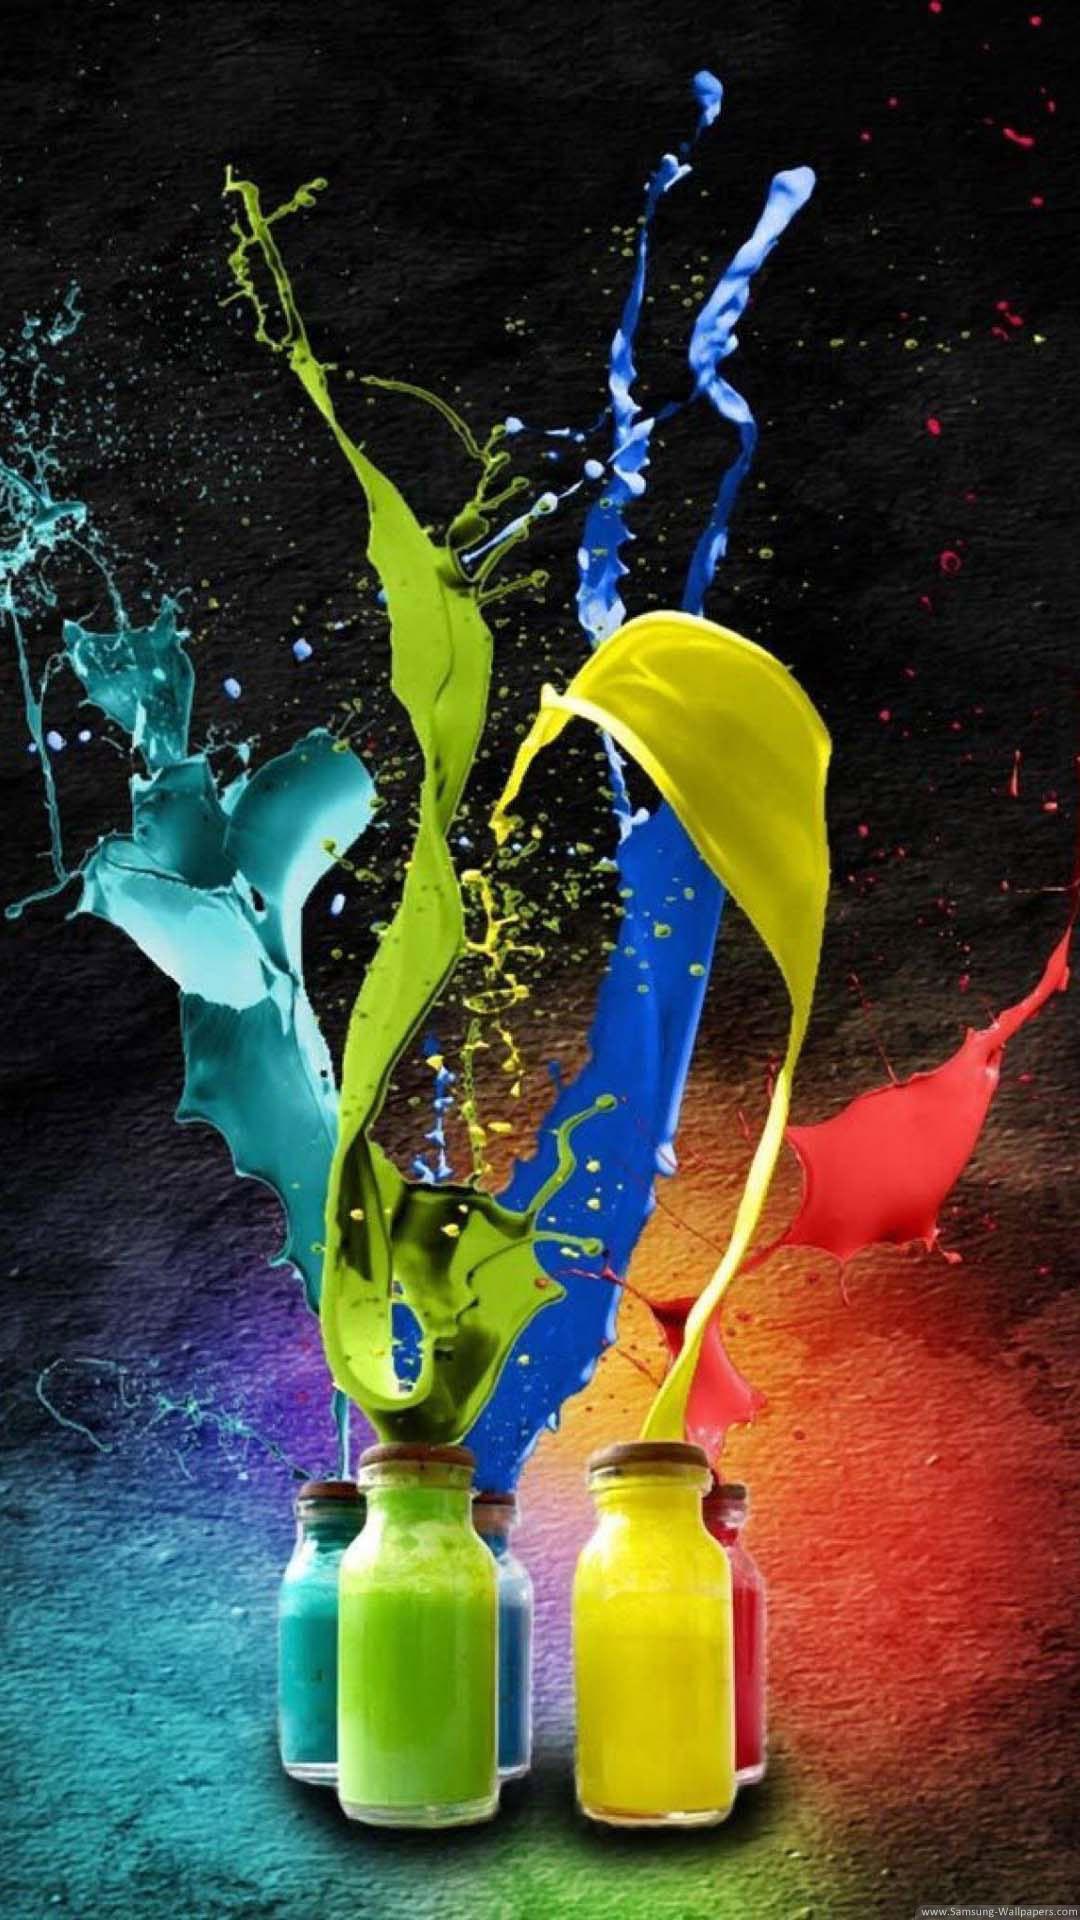 Galaxy S4 Hd Cool Color Desktop Samsung Wallpaper Sfondi